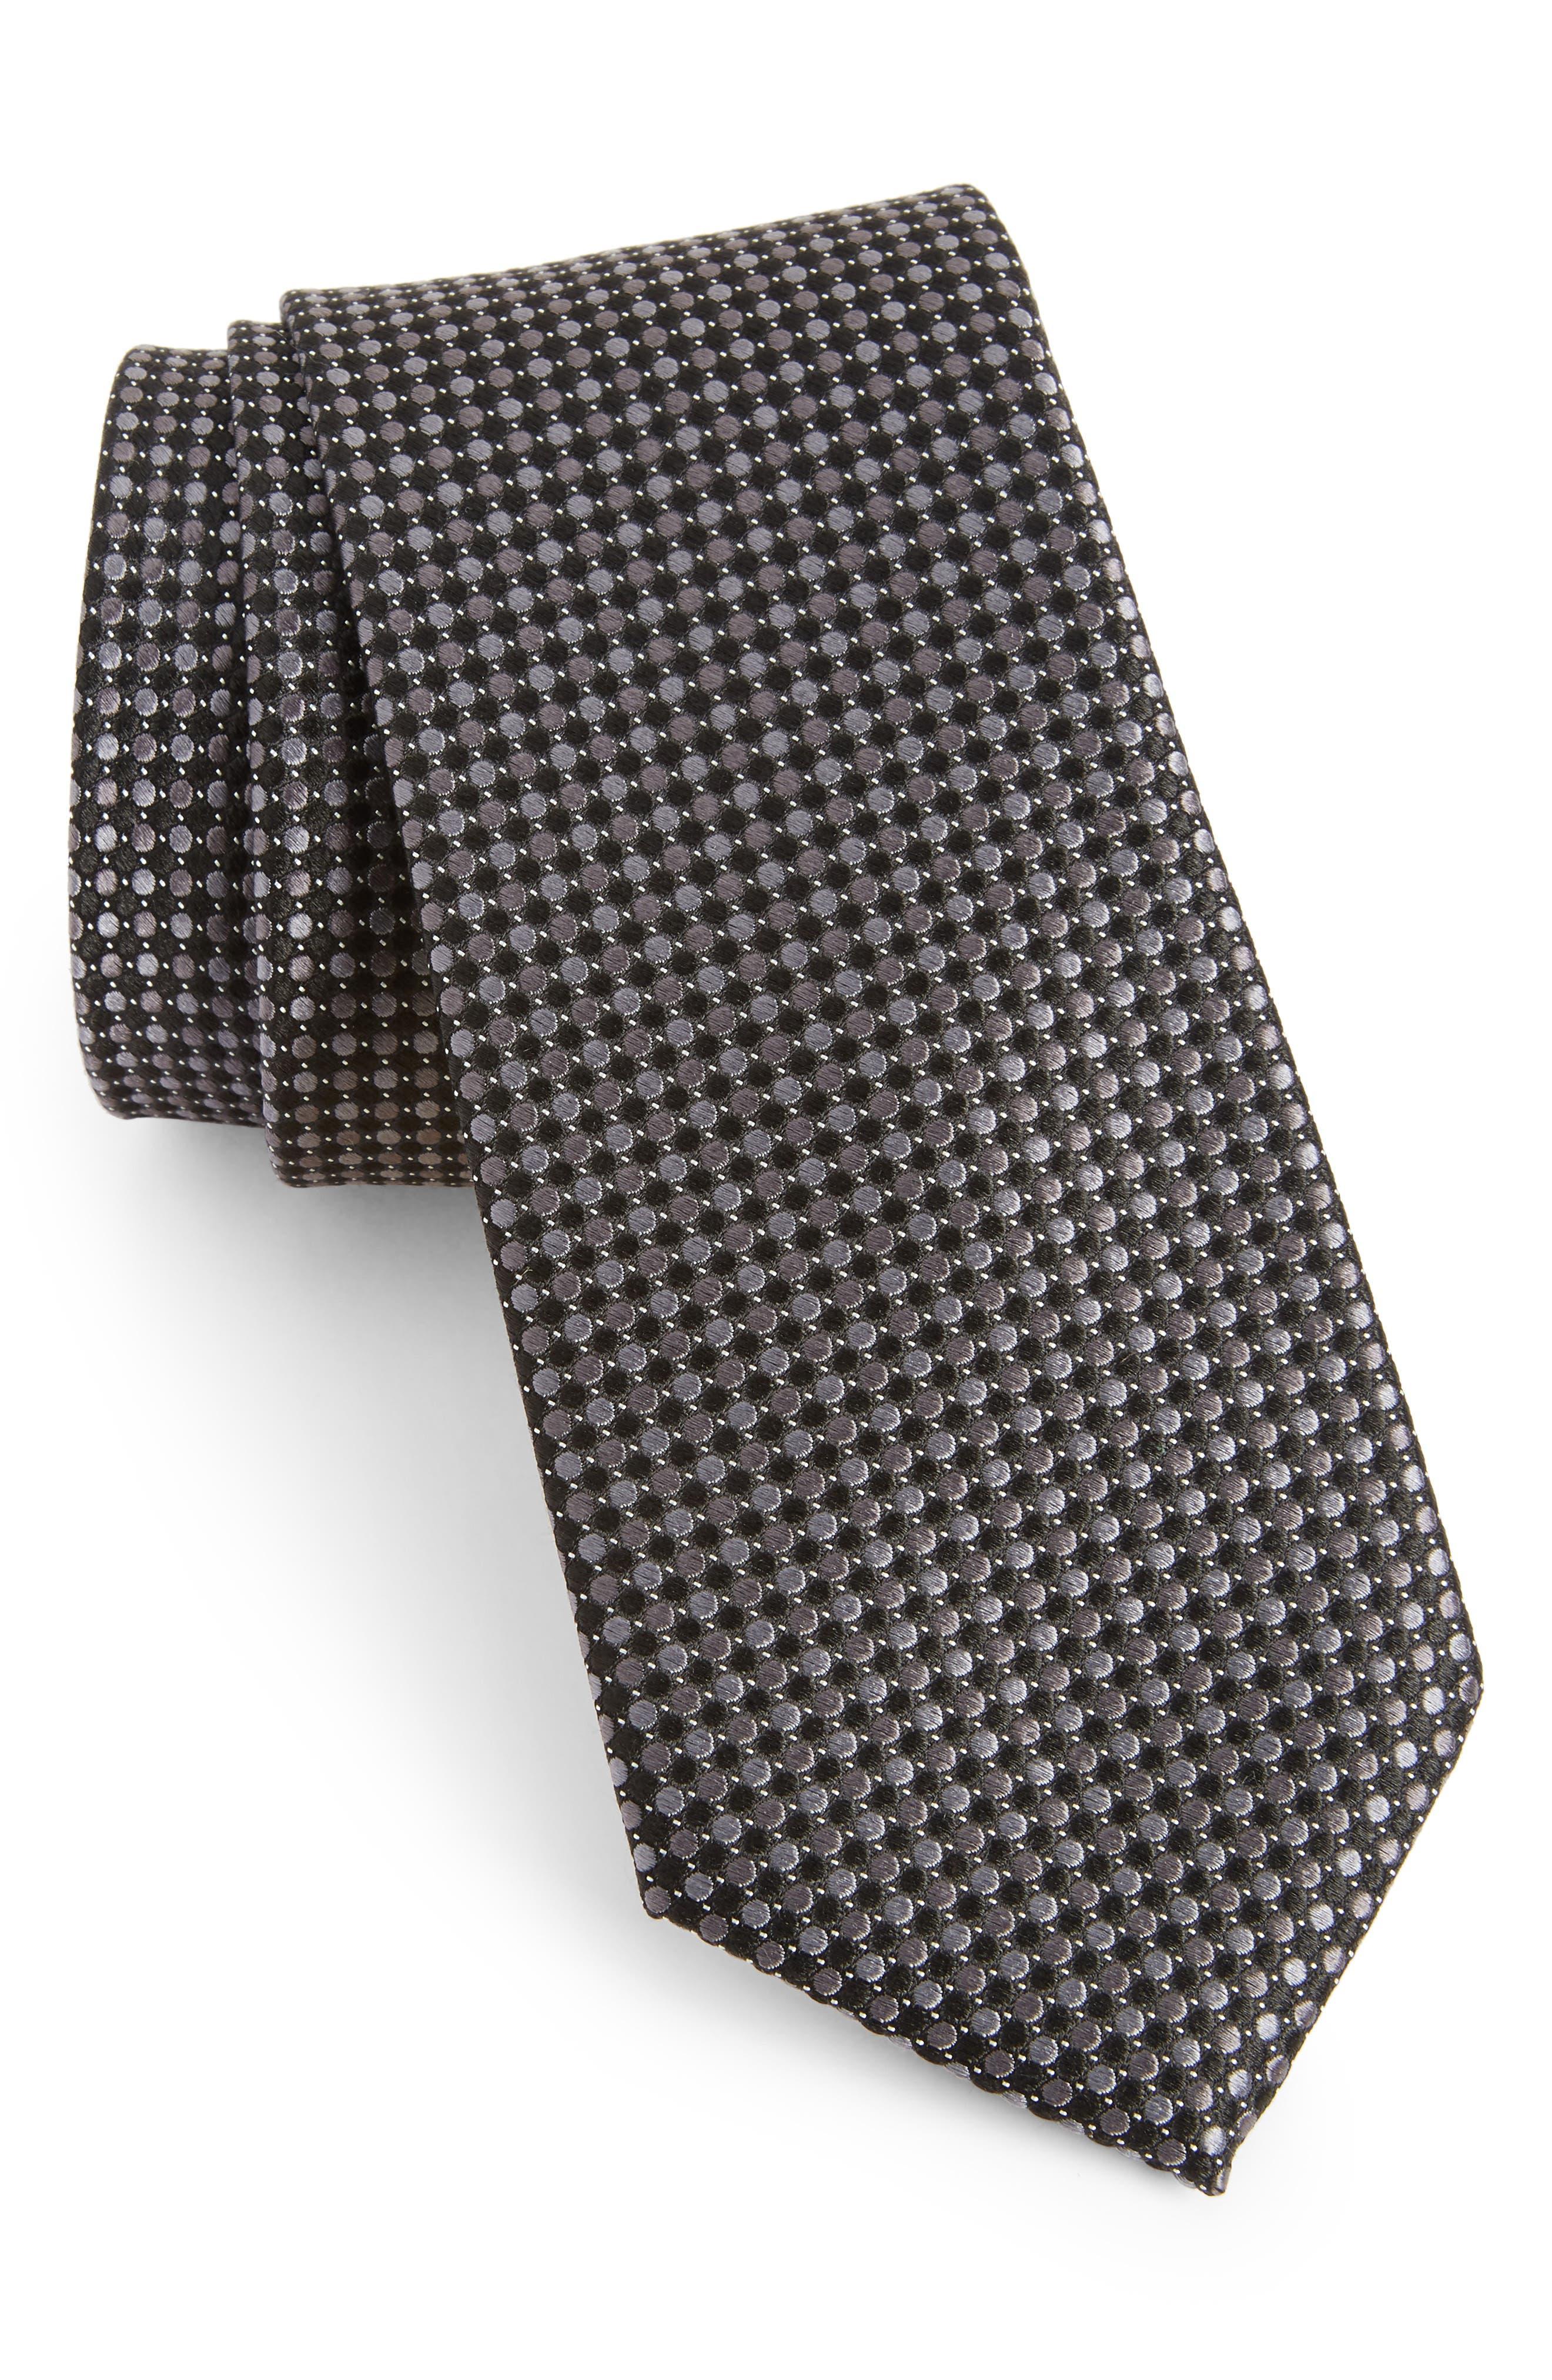 NORDSTROM MEN'S SHOP, Morris Micro Silk Tie, Main thumbnail 1, color, BLACK